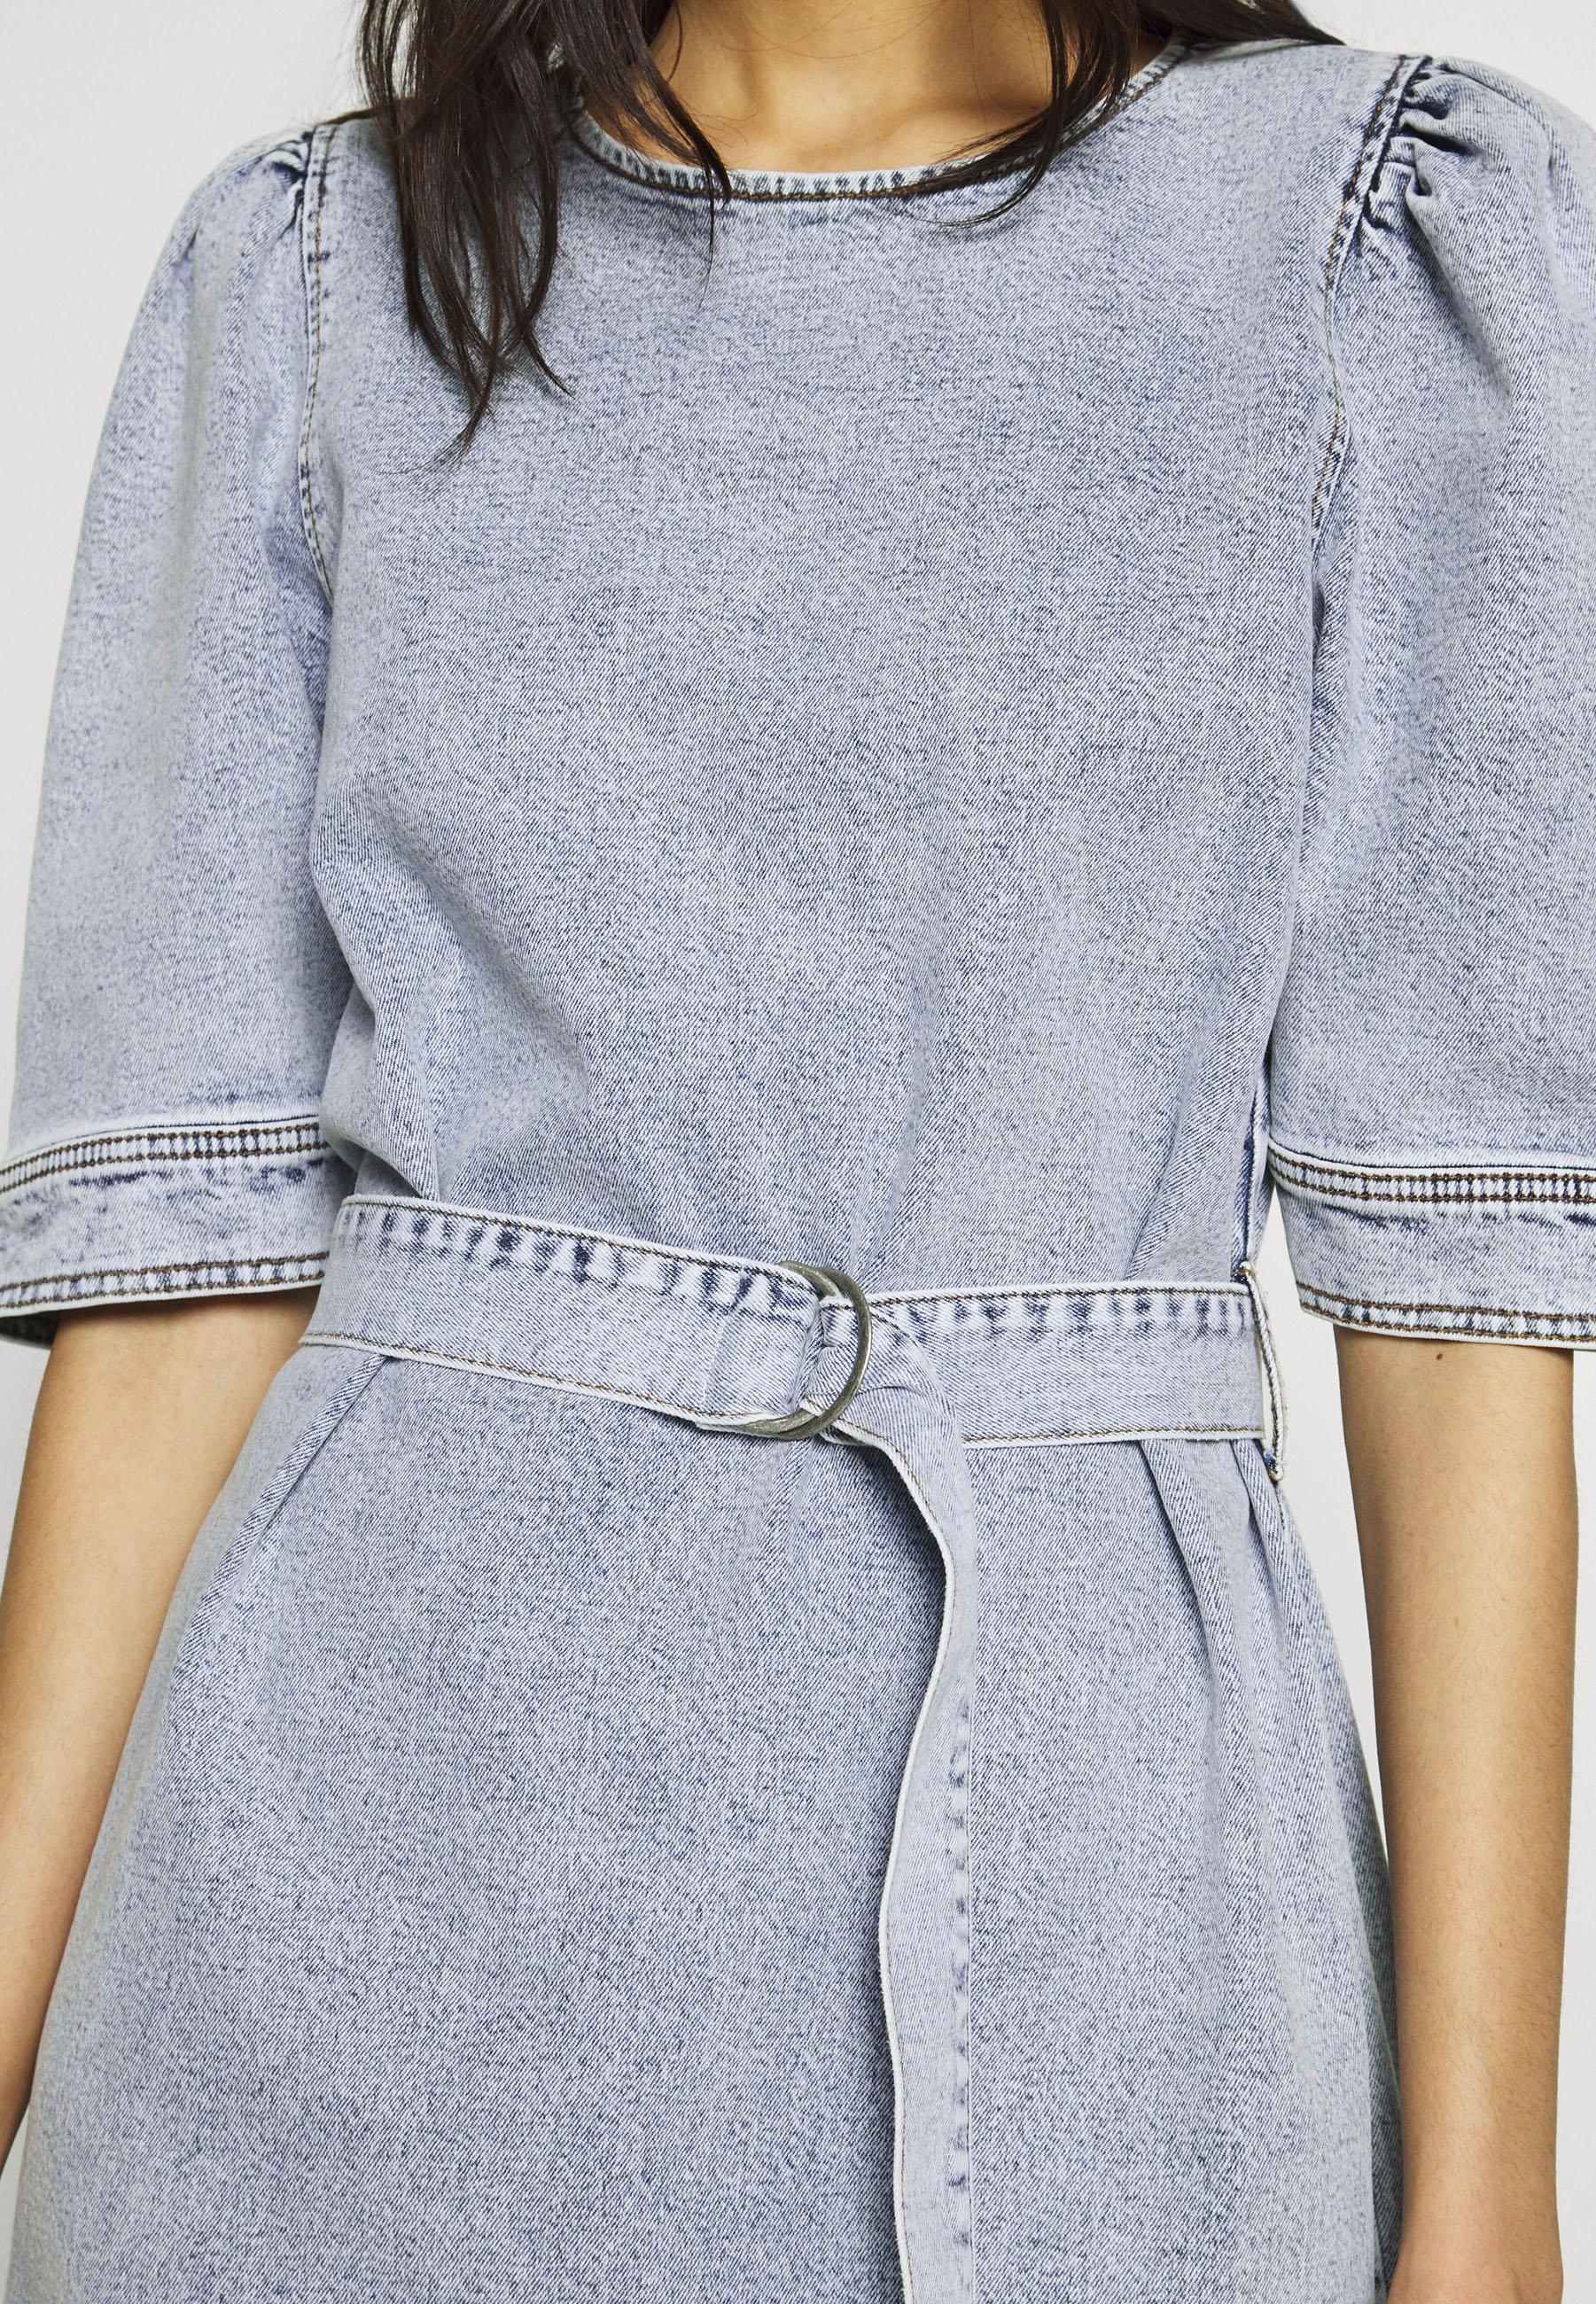 Gestuz Atica Dress - Vestito Di Jeans Light Blue lH3BVTL